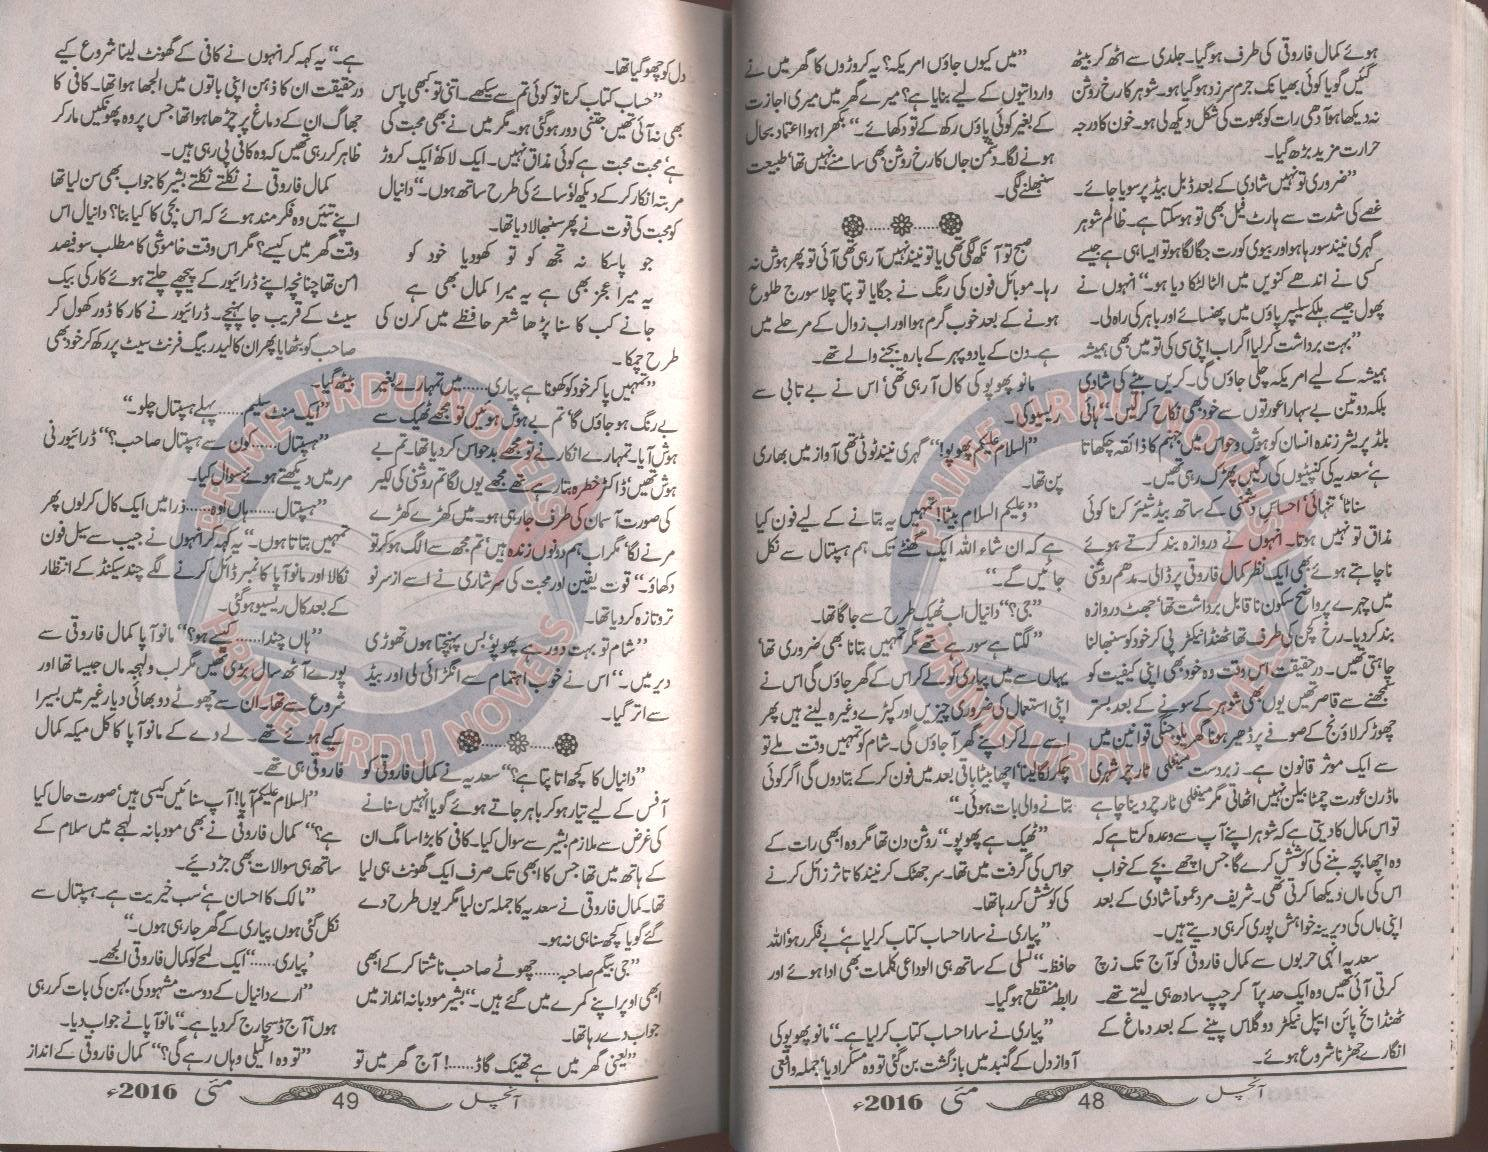 kutub khana essay in urdu Identity of evil 12 hours help my essay coupon code onondaga community college wayne county, kreis berechnen beispiel essay w 138th street zip 10031,.